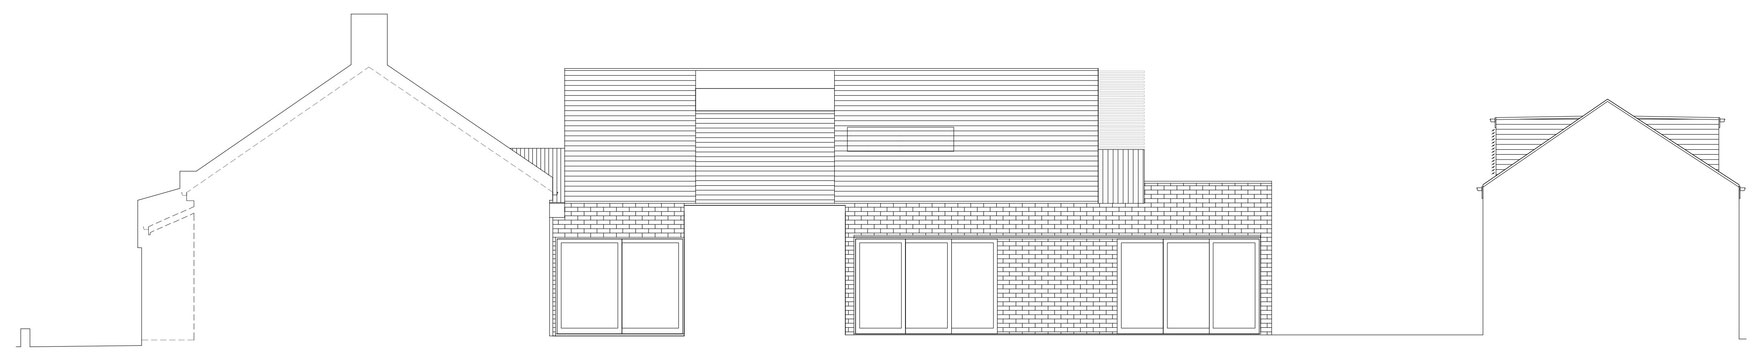 Bondi-House-15